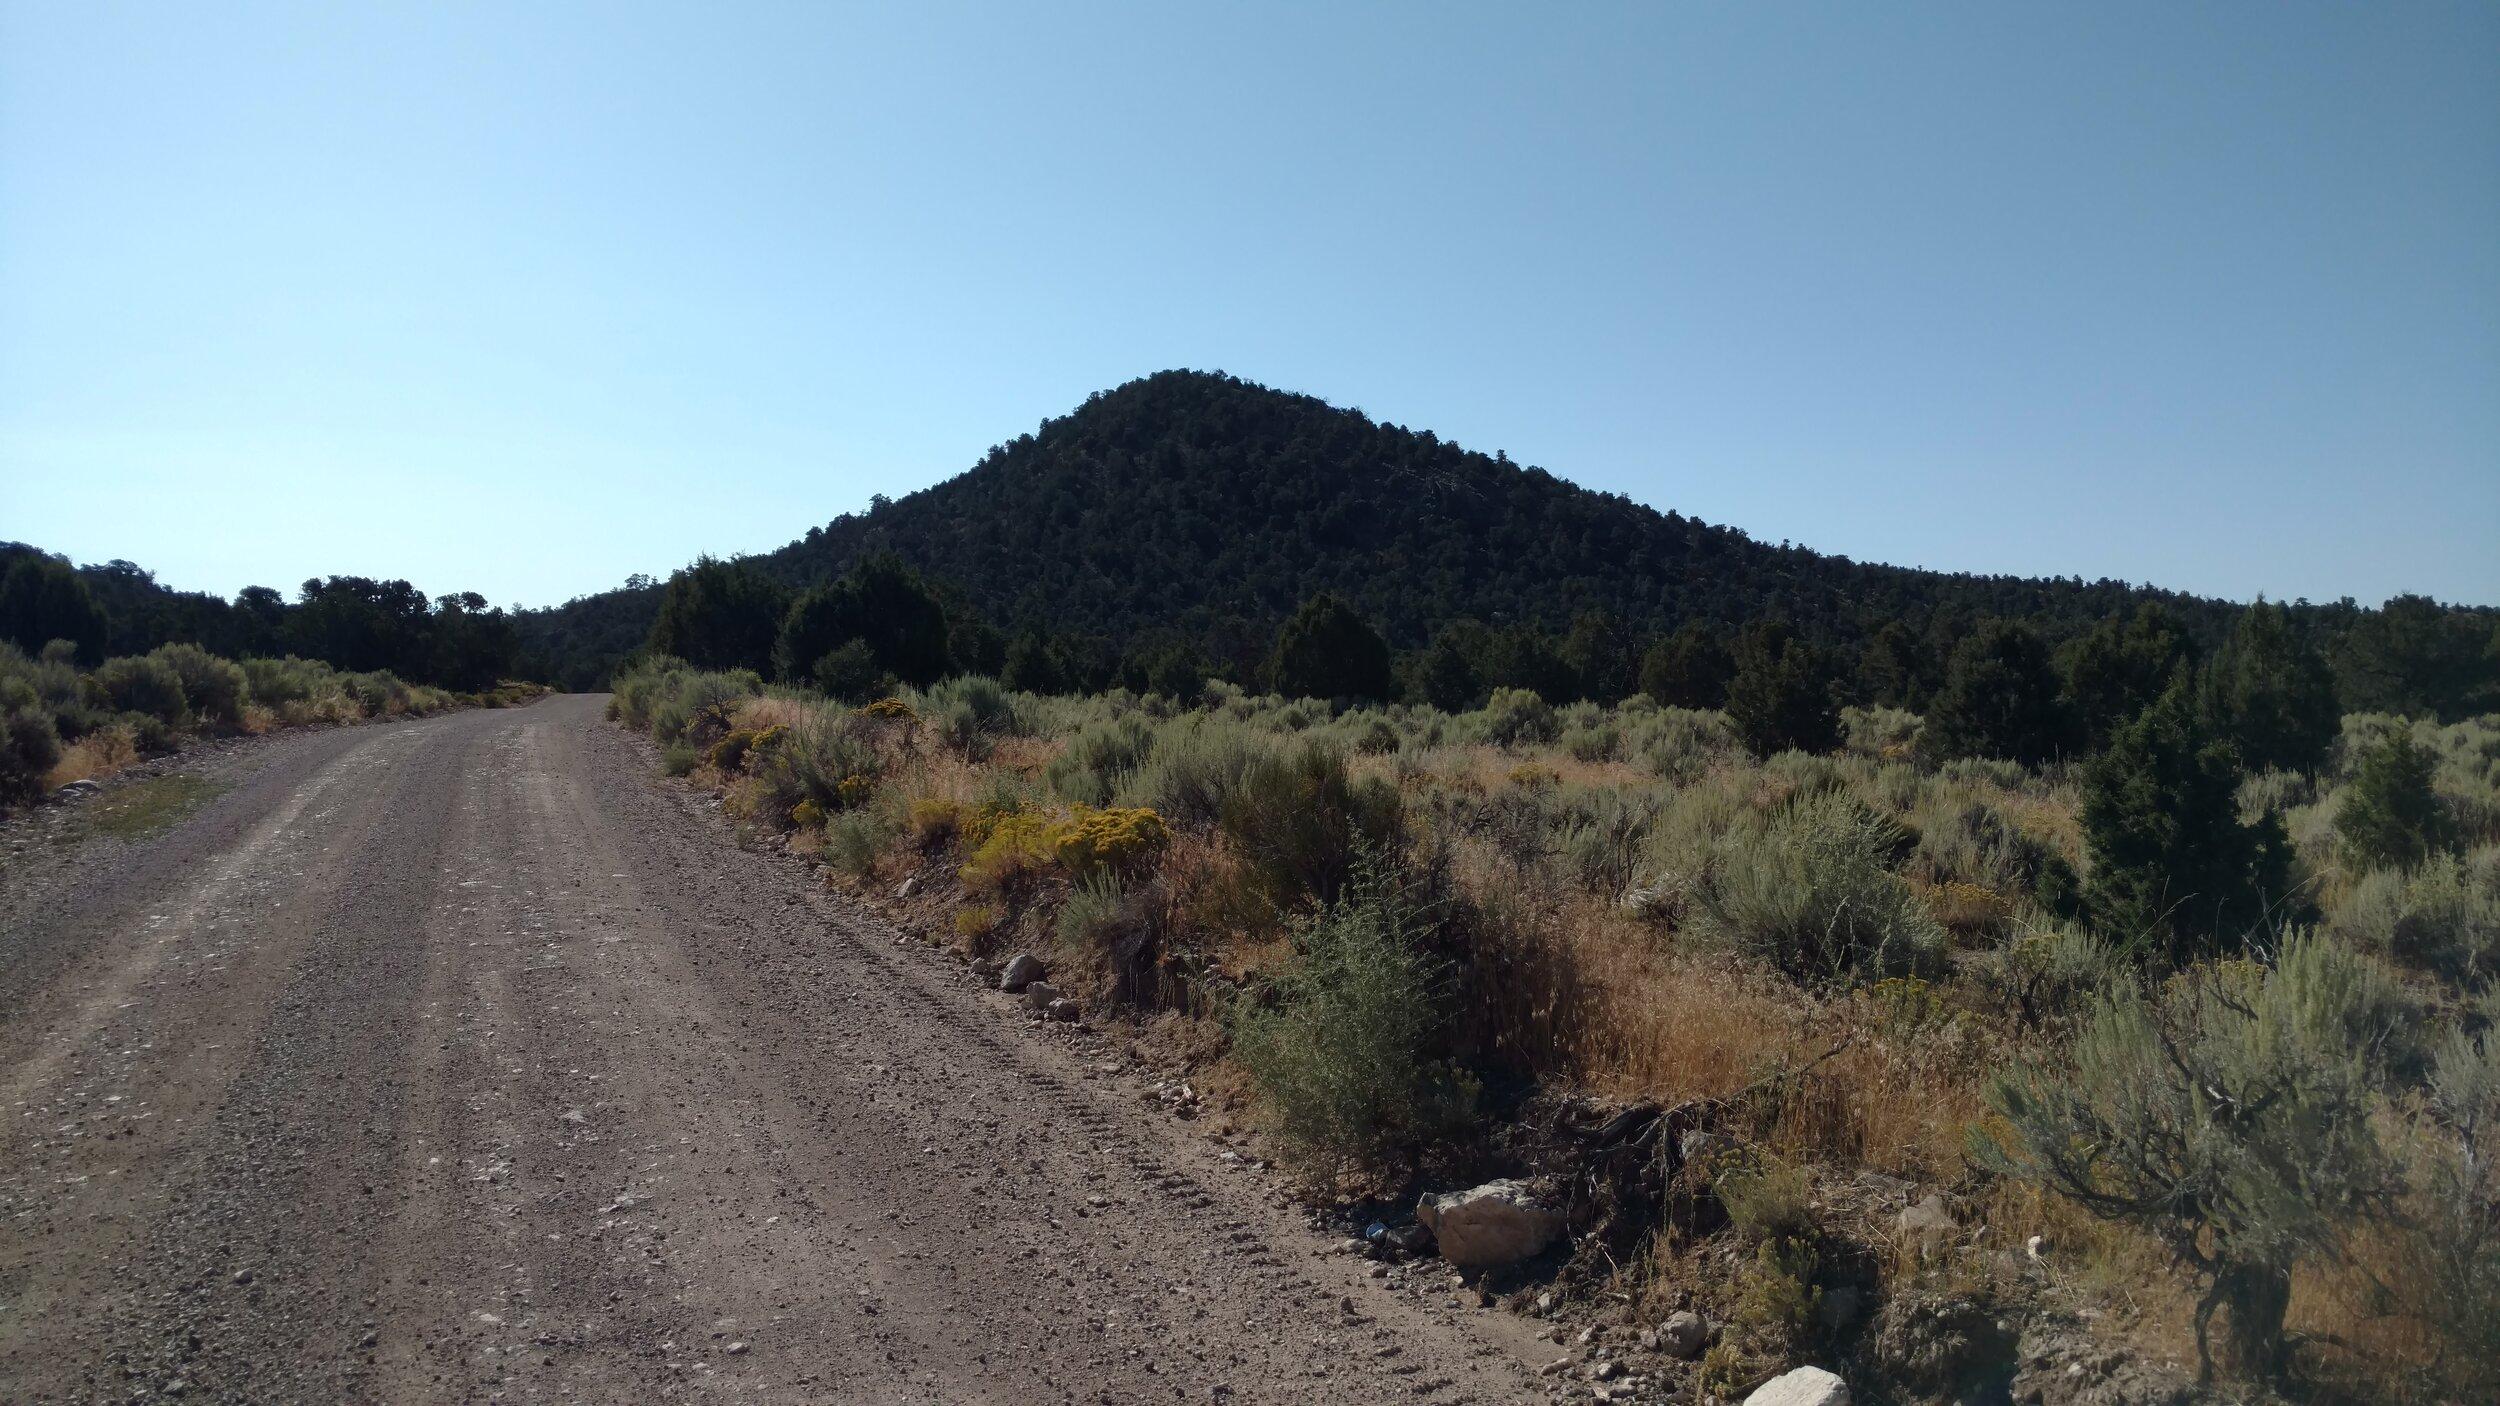 Unnamed peak 7169; Beaver County; The Tetons quadrangle; unranked.